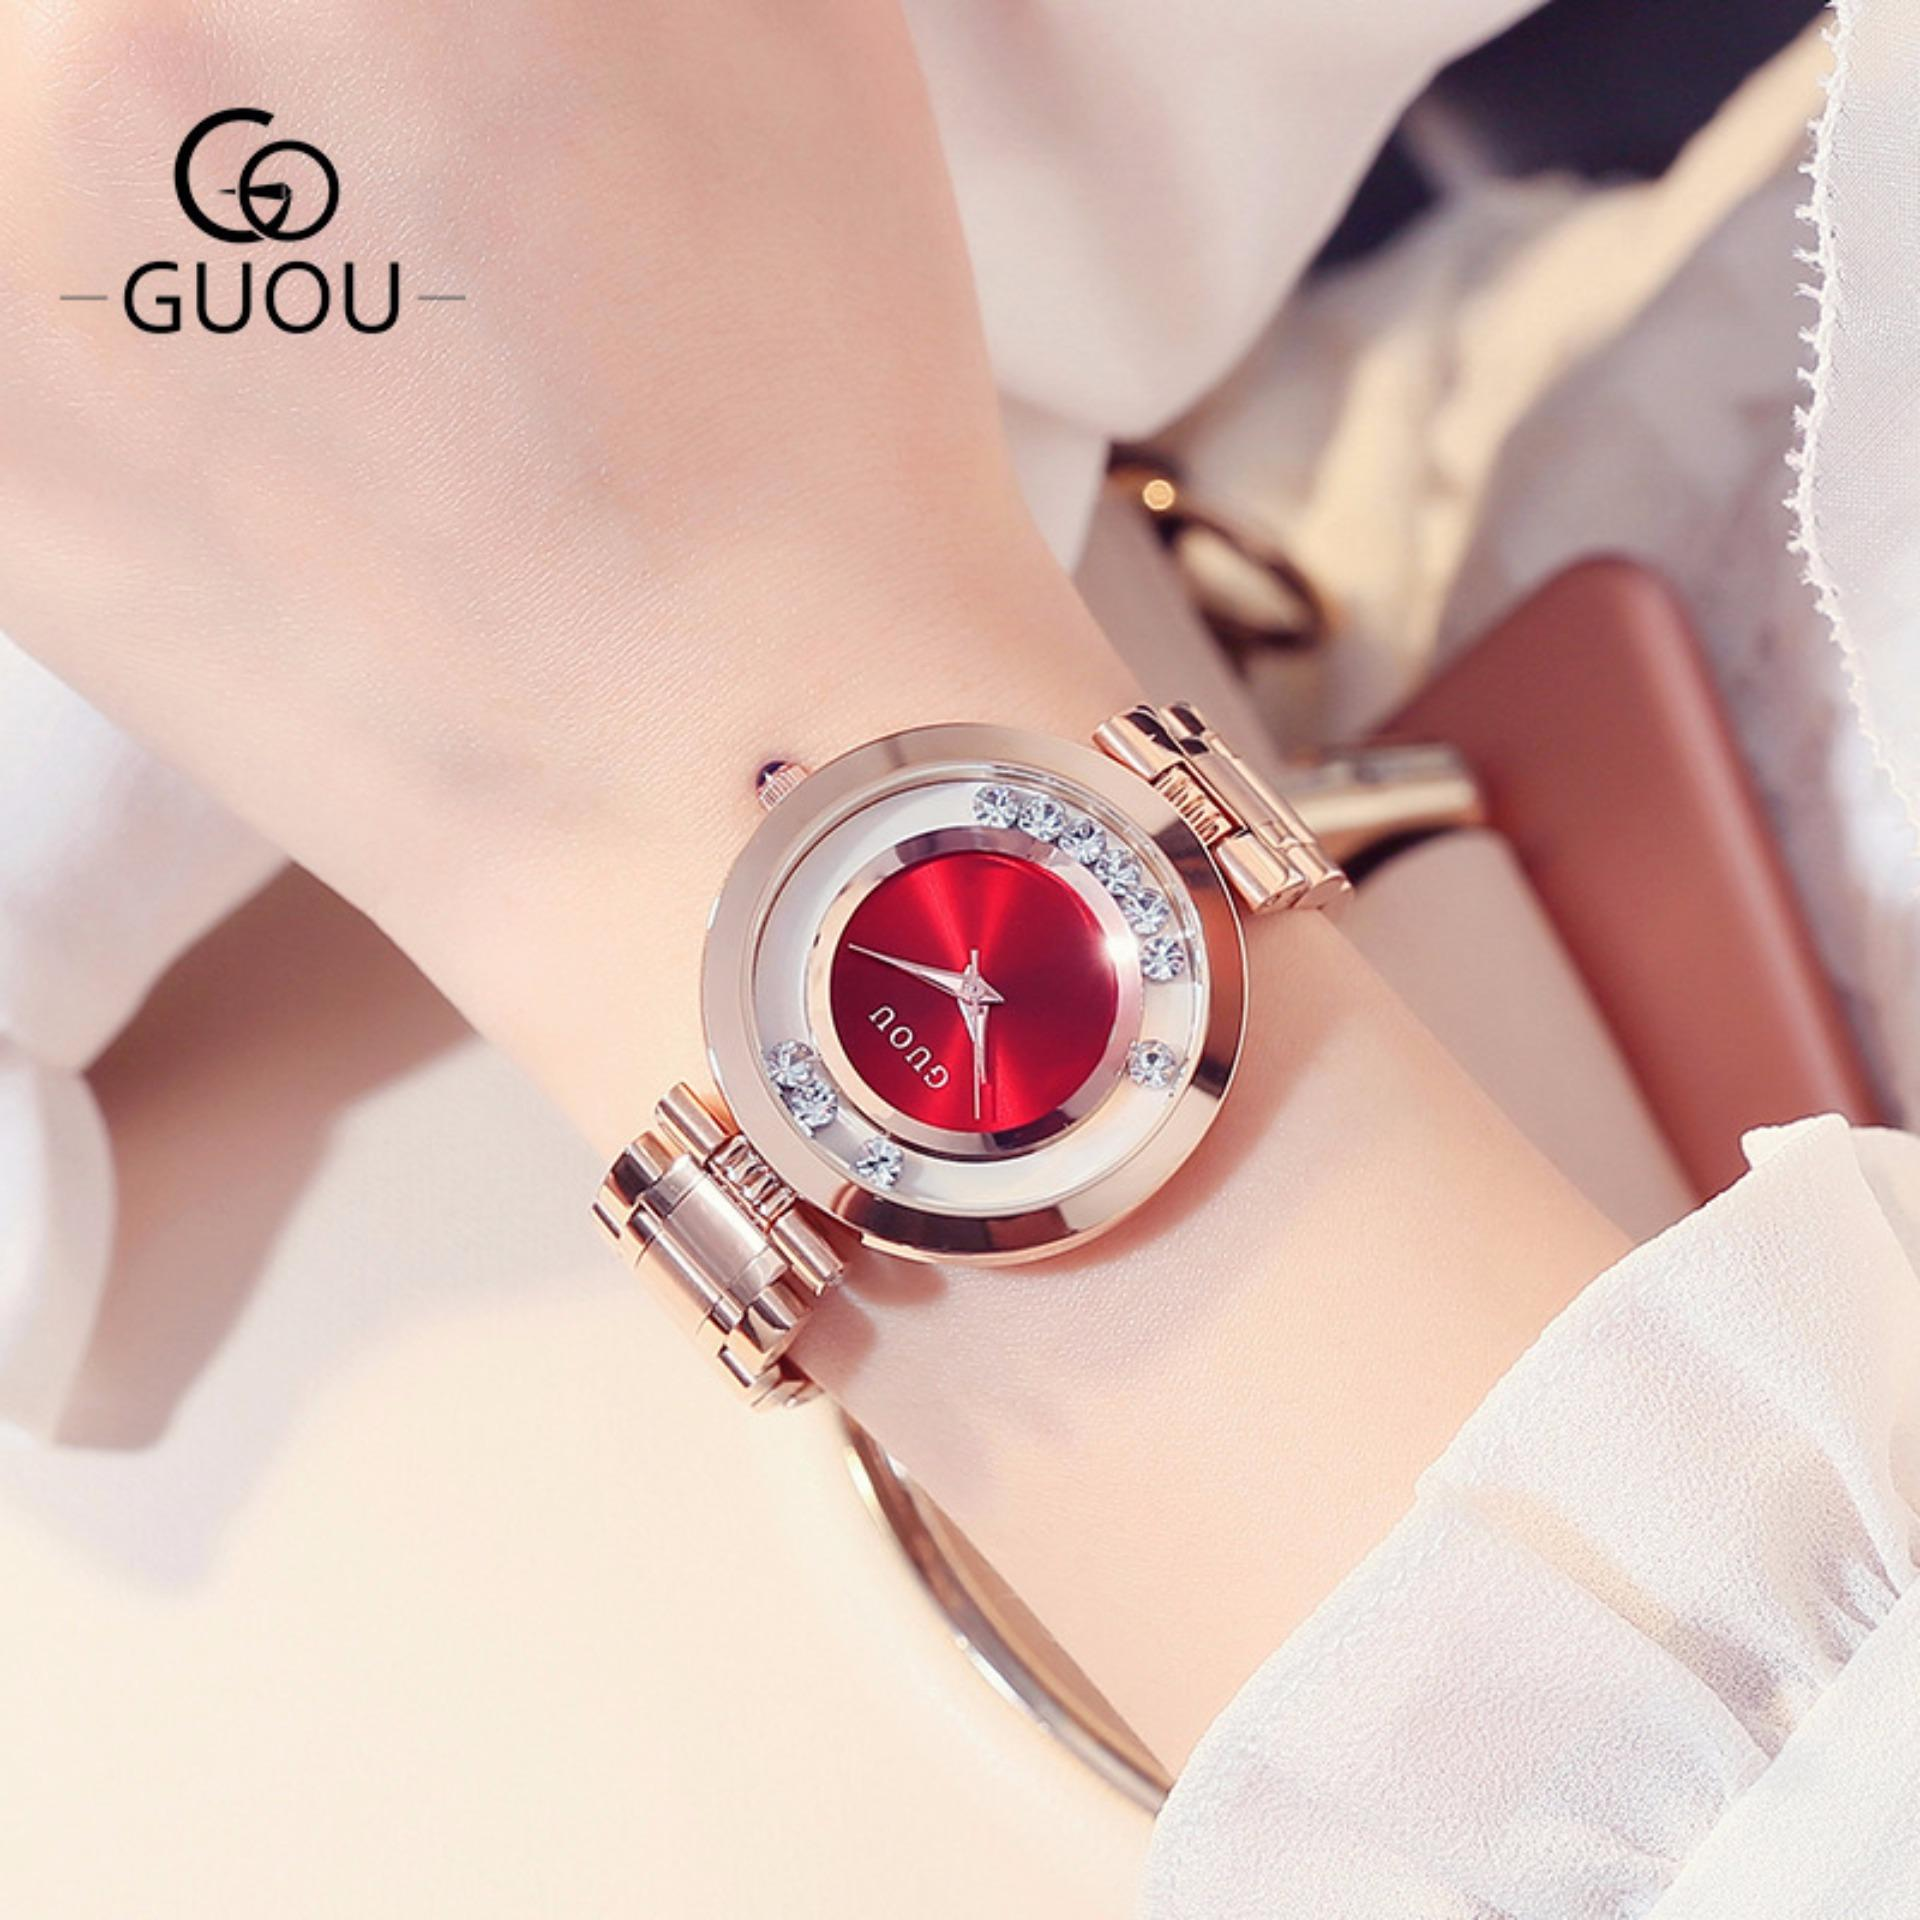 CANADO Đồng Hồ Nữ GUOU New Famous Brand Fashion Rose Quartz Gold Watches Women Waterproof SB106 (Vàng Hồng)